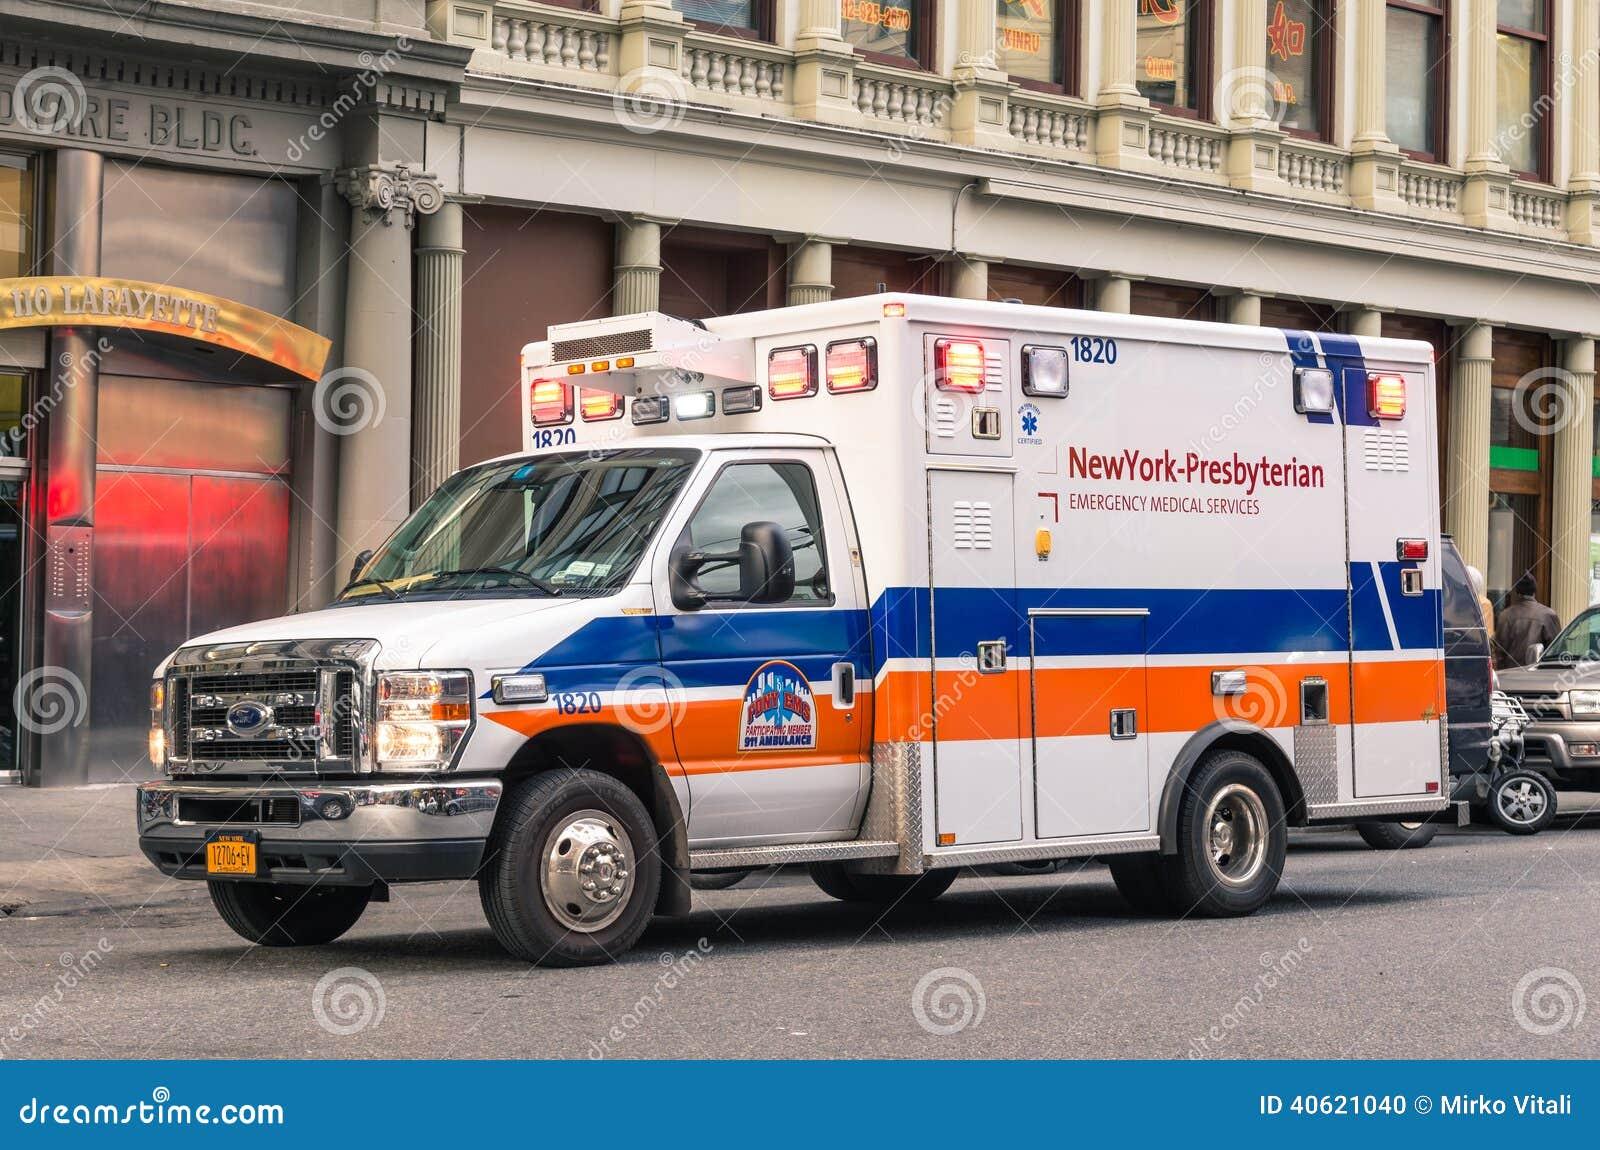 New York Presbyterian Hospital Van During Service